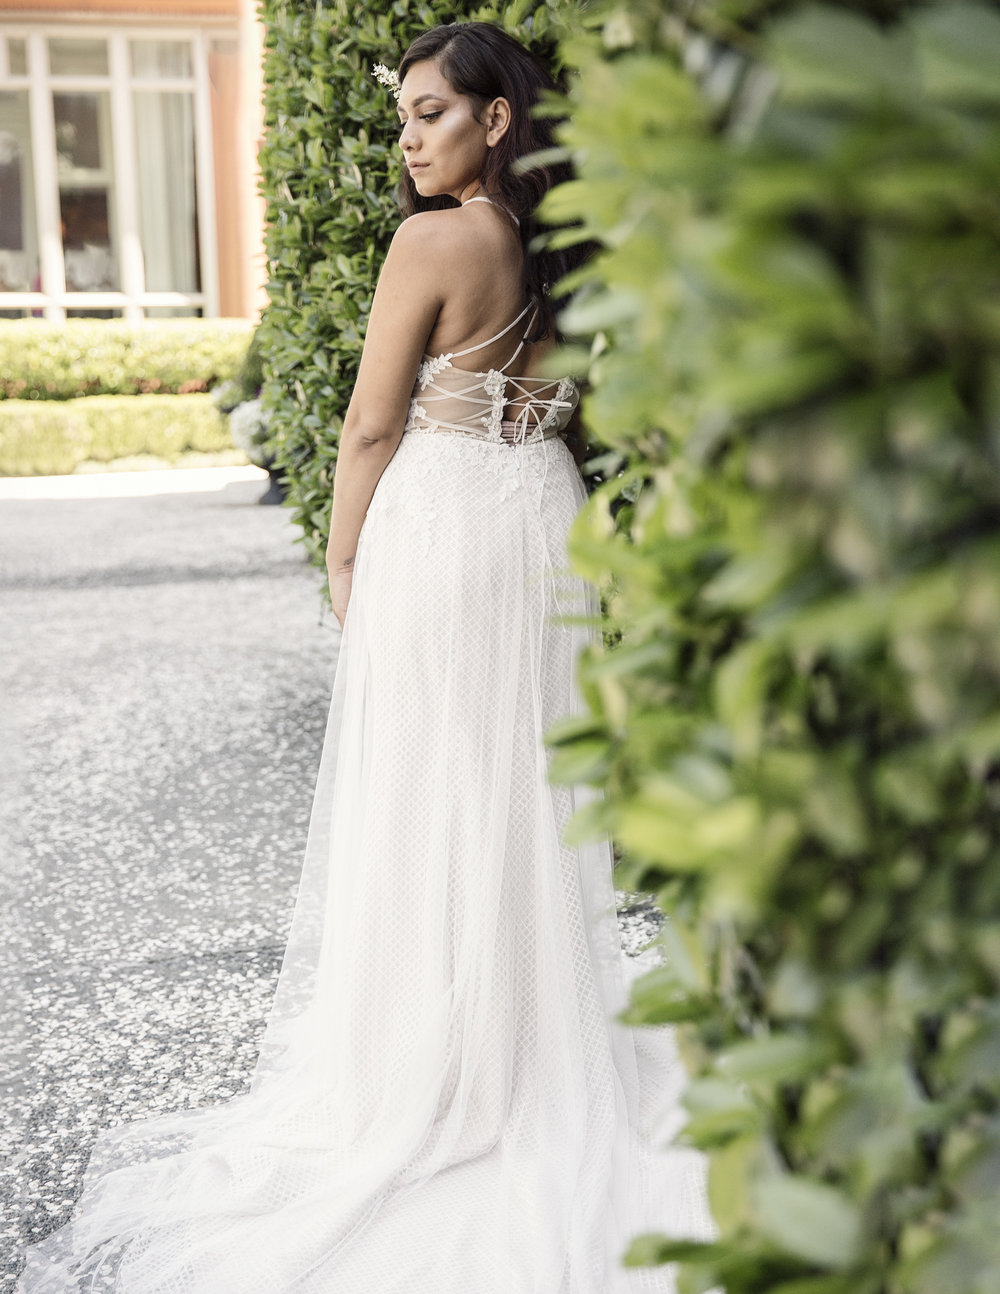 savannah-bridal-shop-unexpected-joys-of-wedding-planning-savannah-wedding-planning-gina-vogel-photography-savannah-weddings-16.jpg